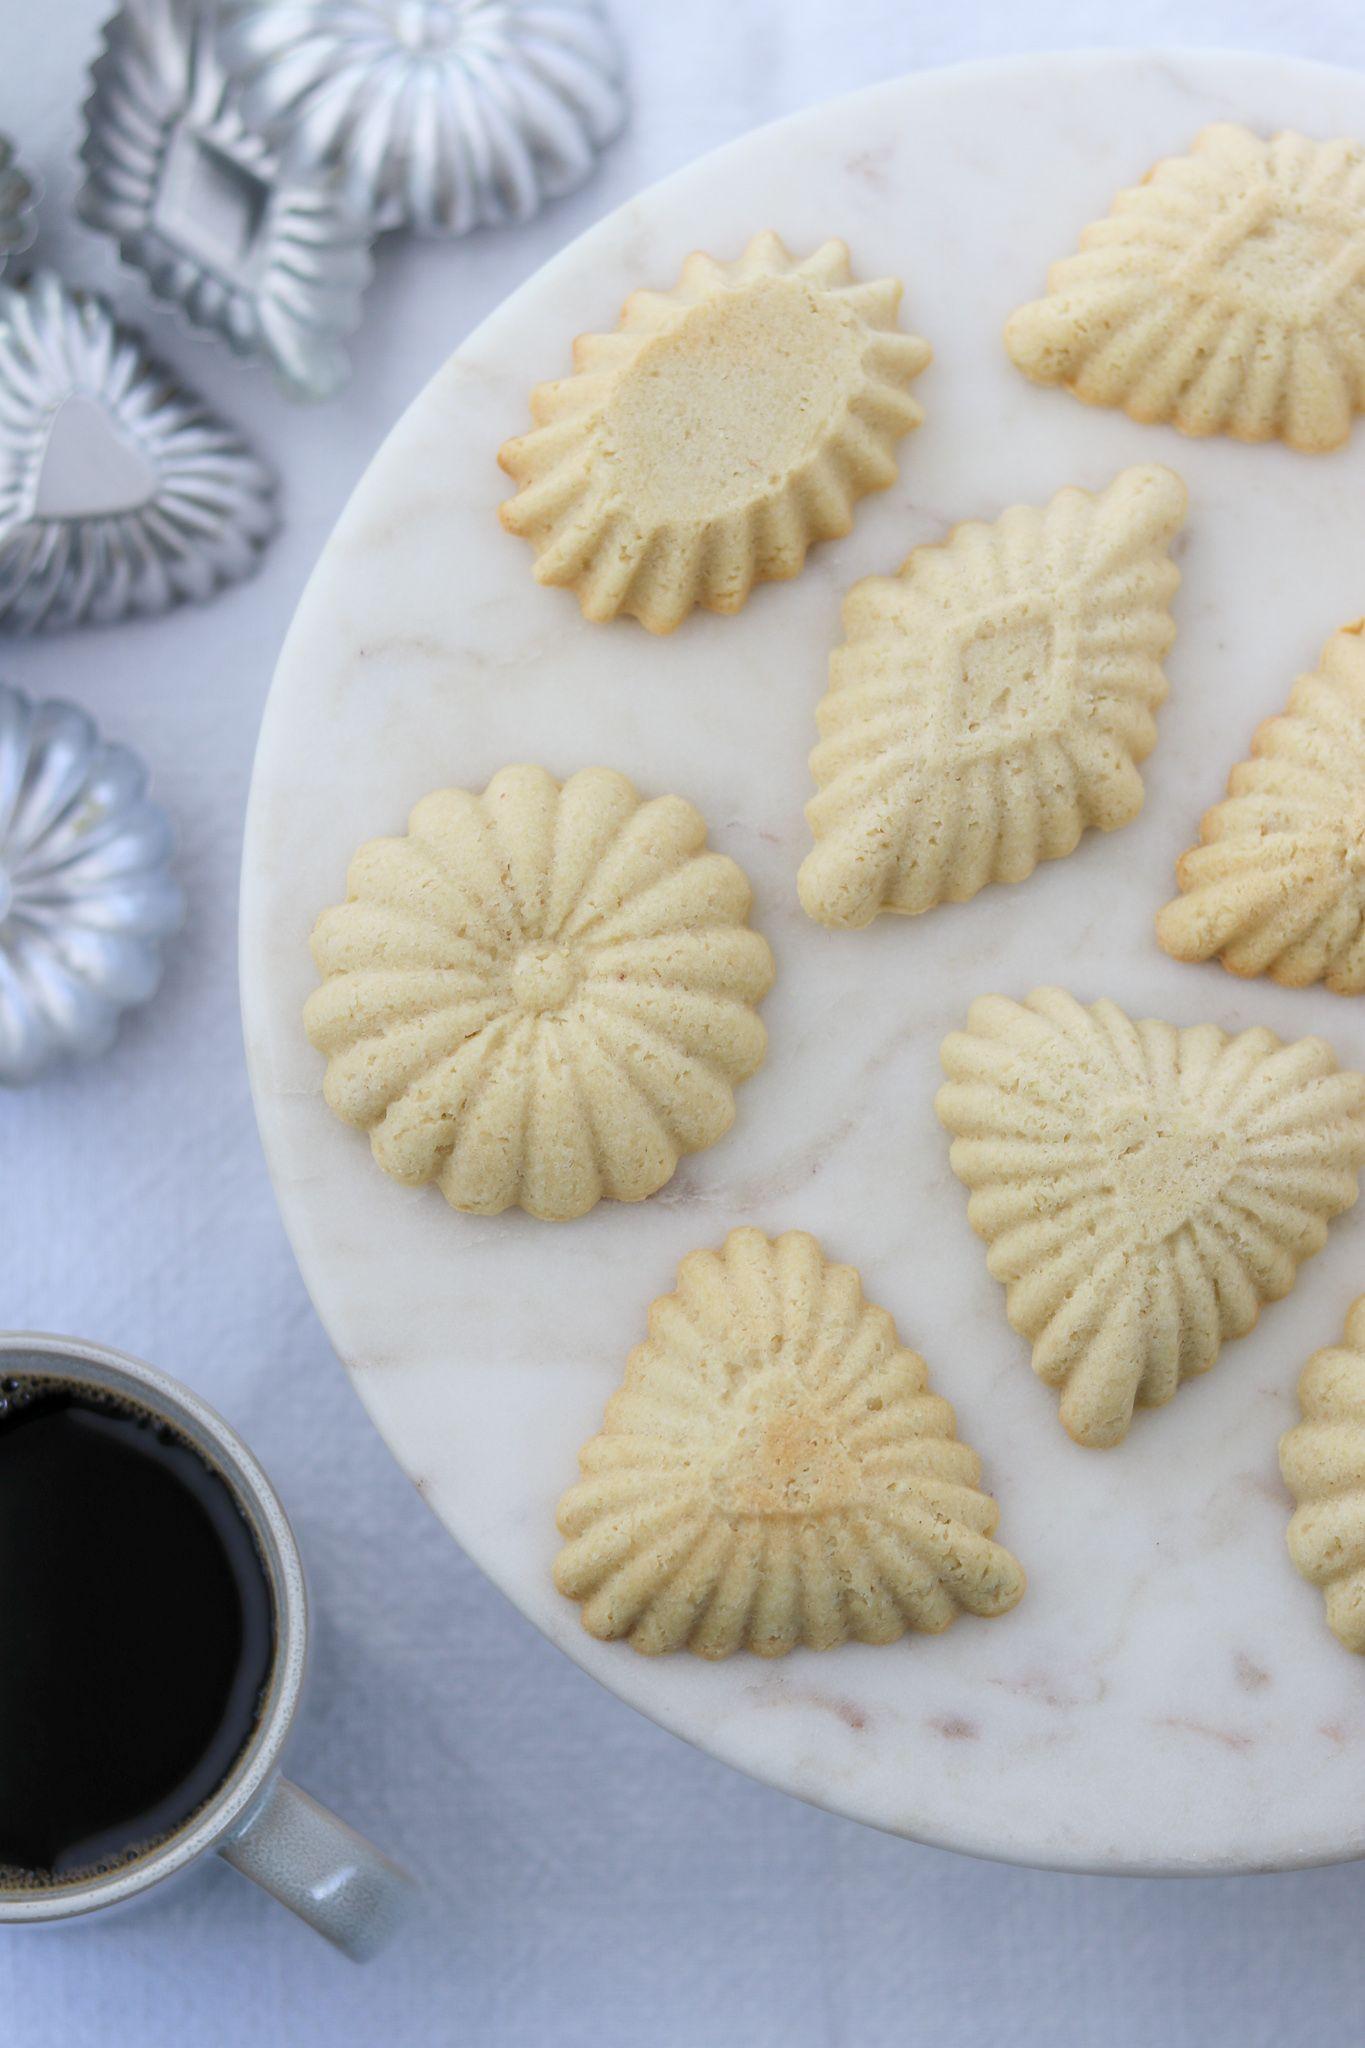 Scandinavian Almond Tartlets Sandbakkels In Norwegian Or Mandelmusslor In Swedish True North Kitchen Recipe In 2020 Tartlets Almond Flavor Almond Cookies